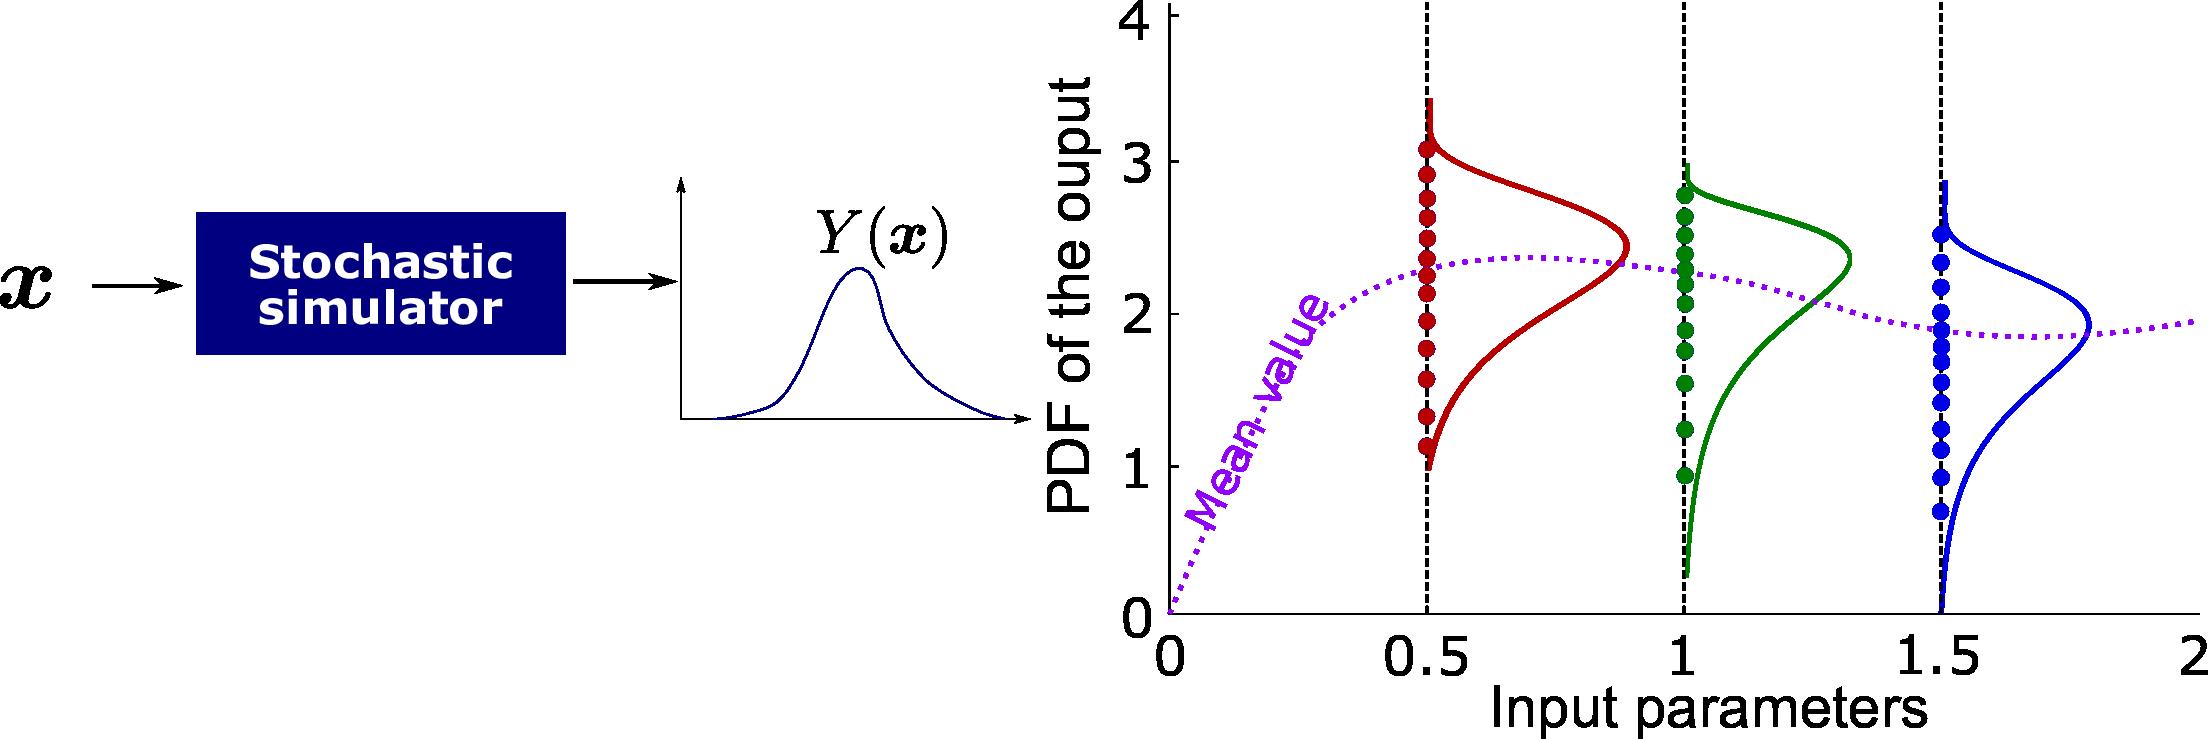 stochastic_simulator